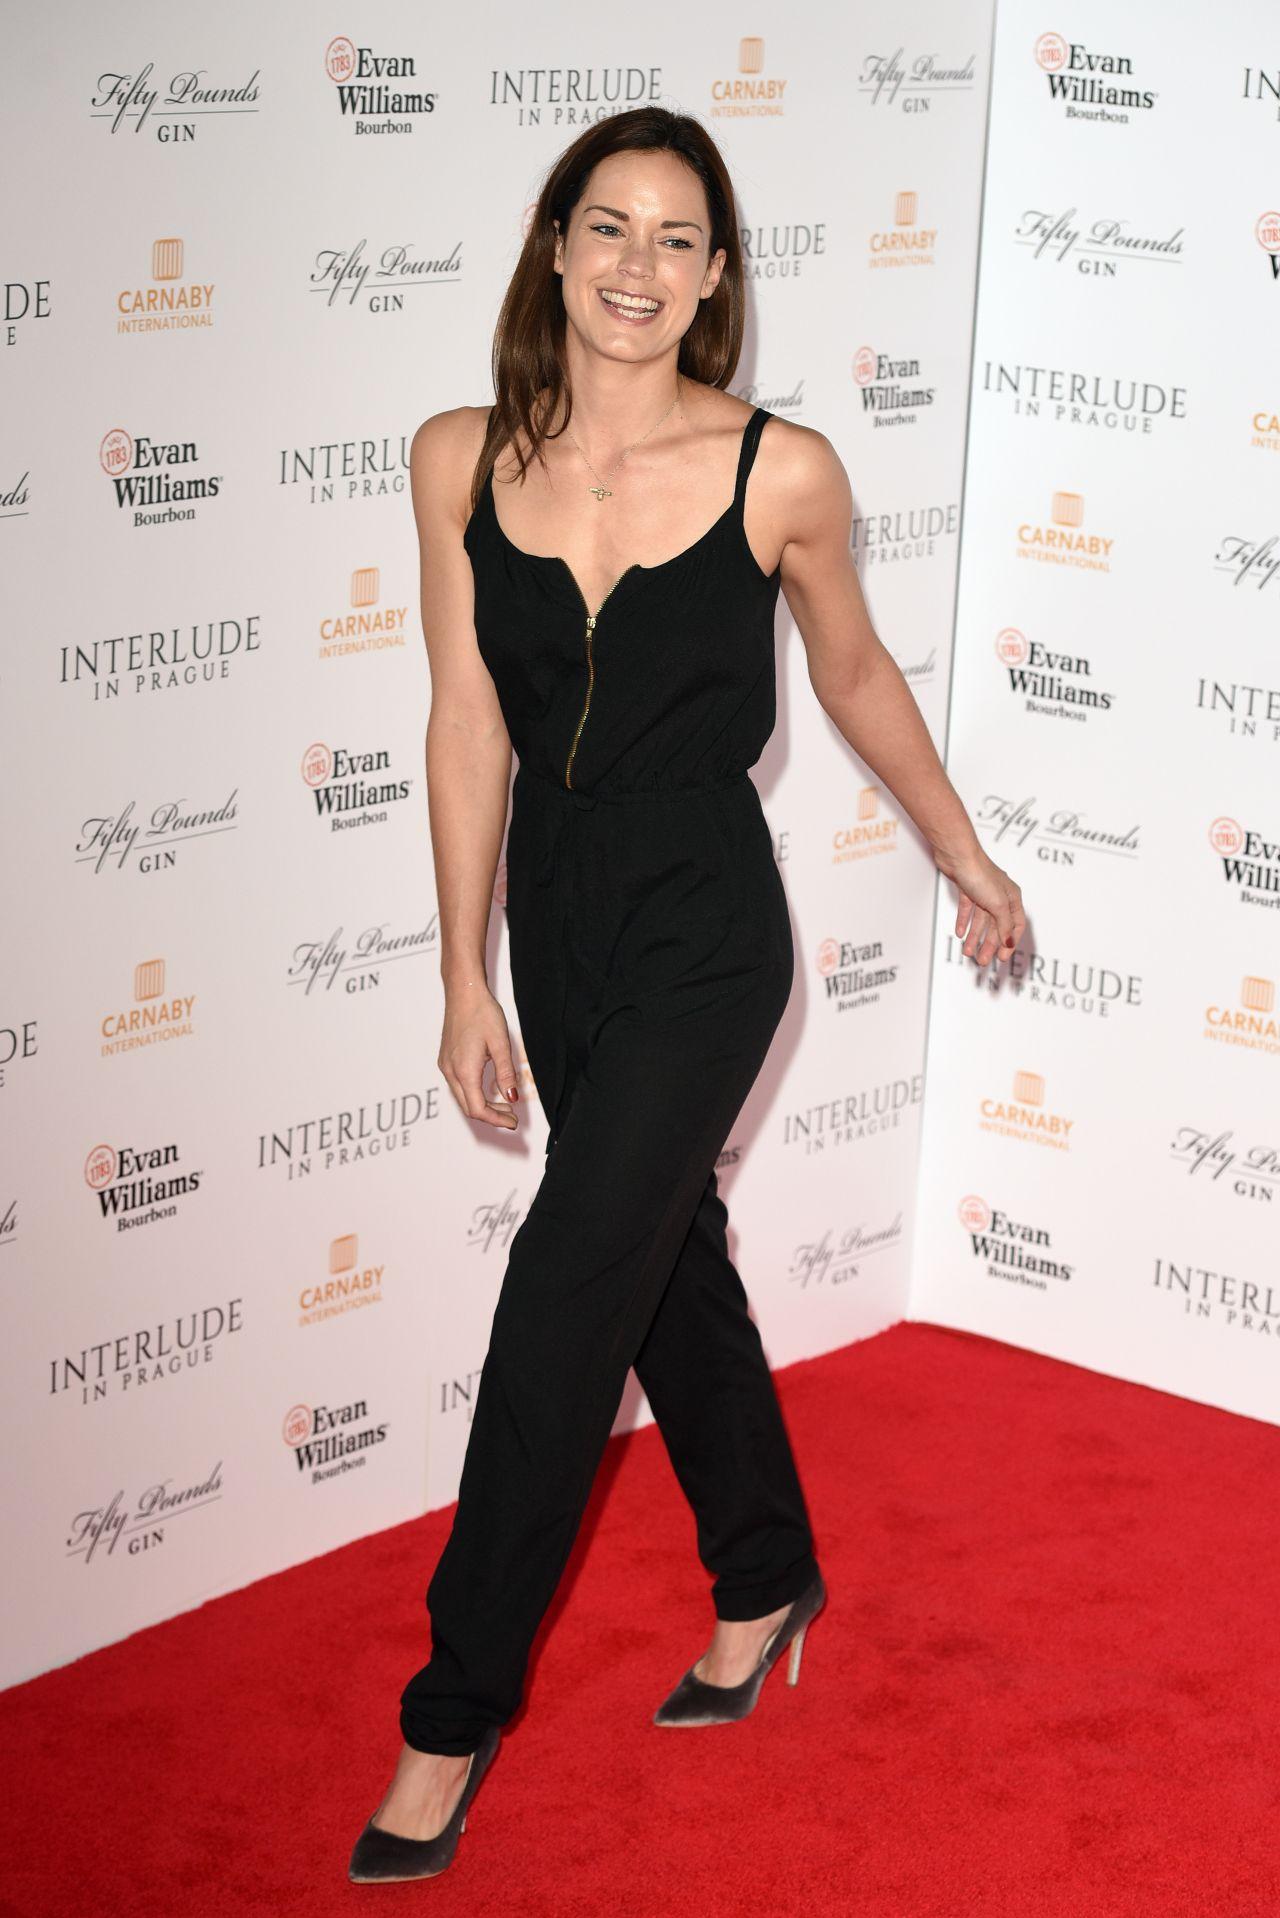 Emily wyatt interlude in prague movie premiere in london nude (21 photos), Twitter Celebrites pic